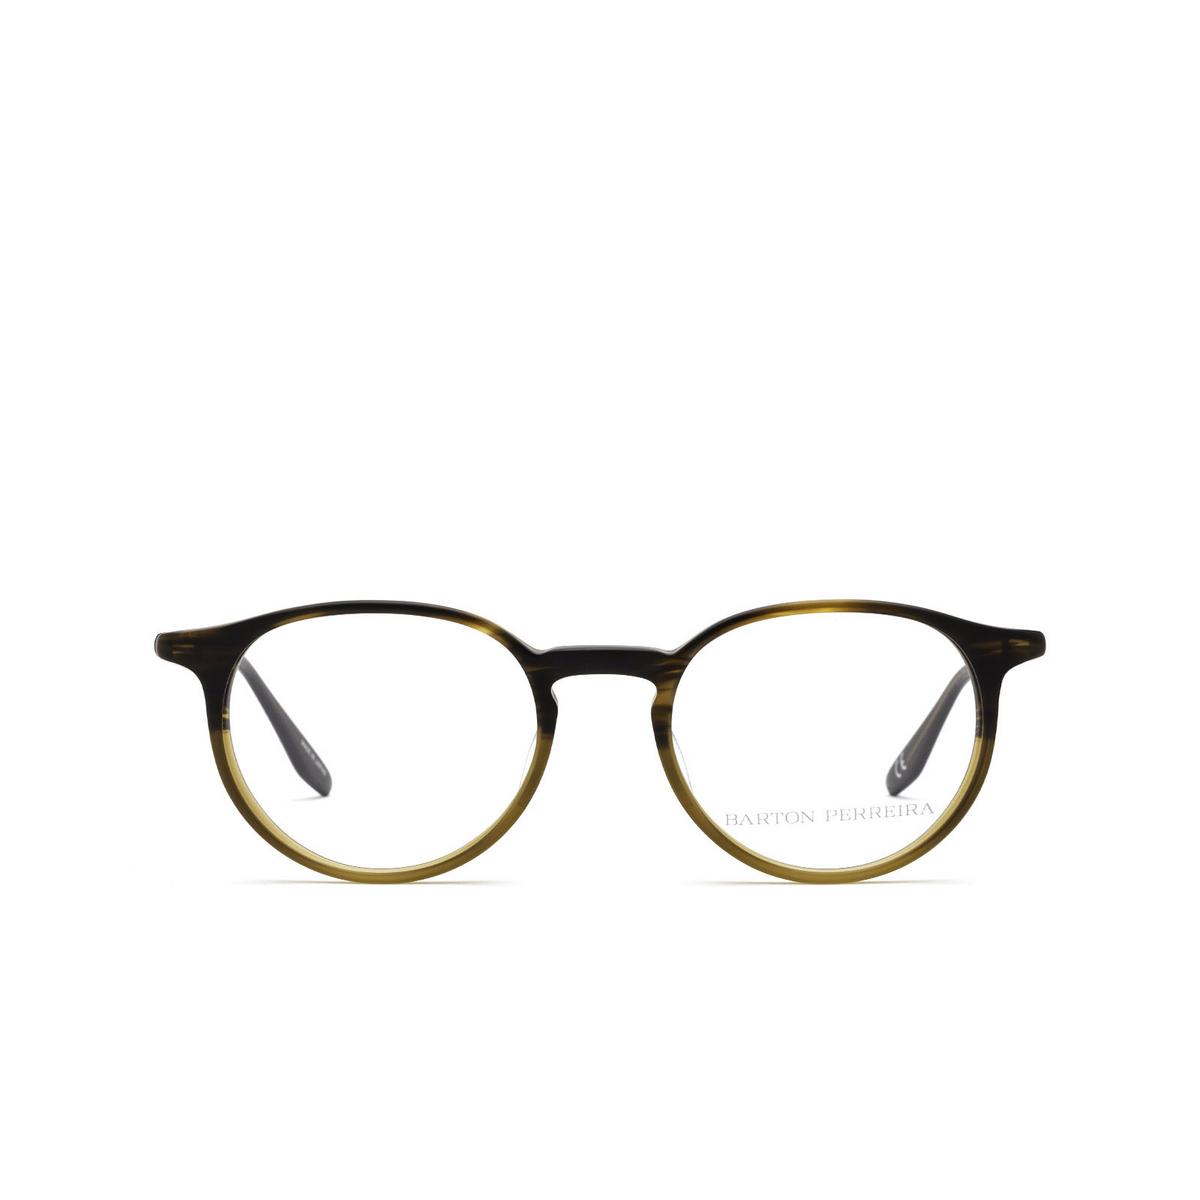 Barton Perreira® Round Eyeglasses: Norton BP5043 color Matte Tortuga Gradient 1PZ - front view.